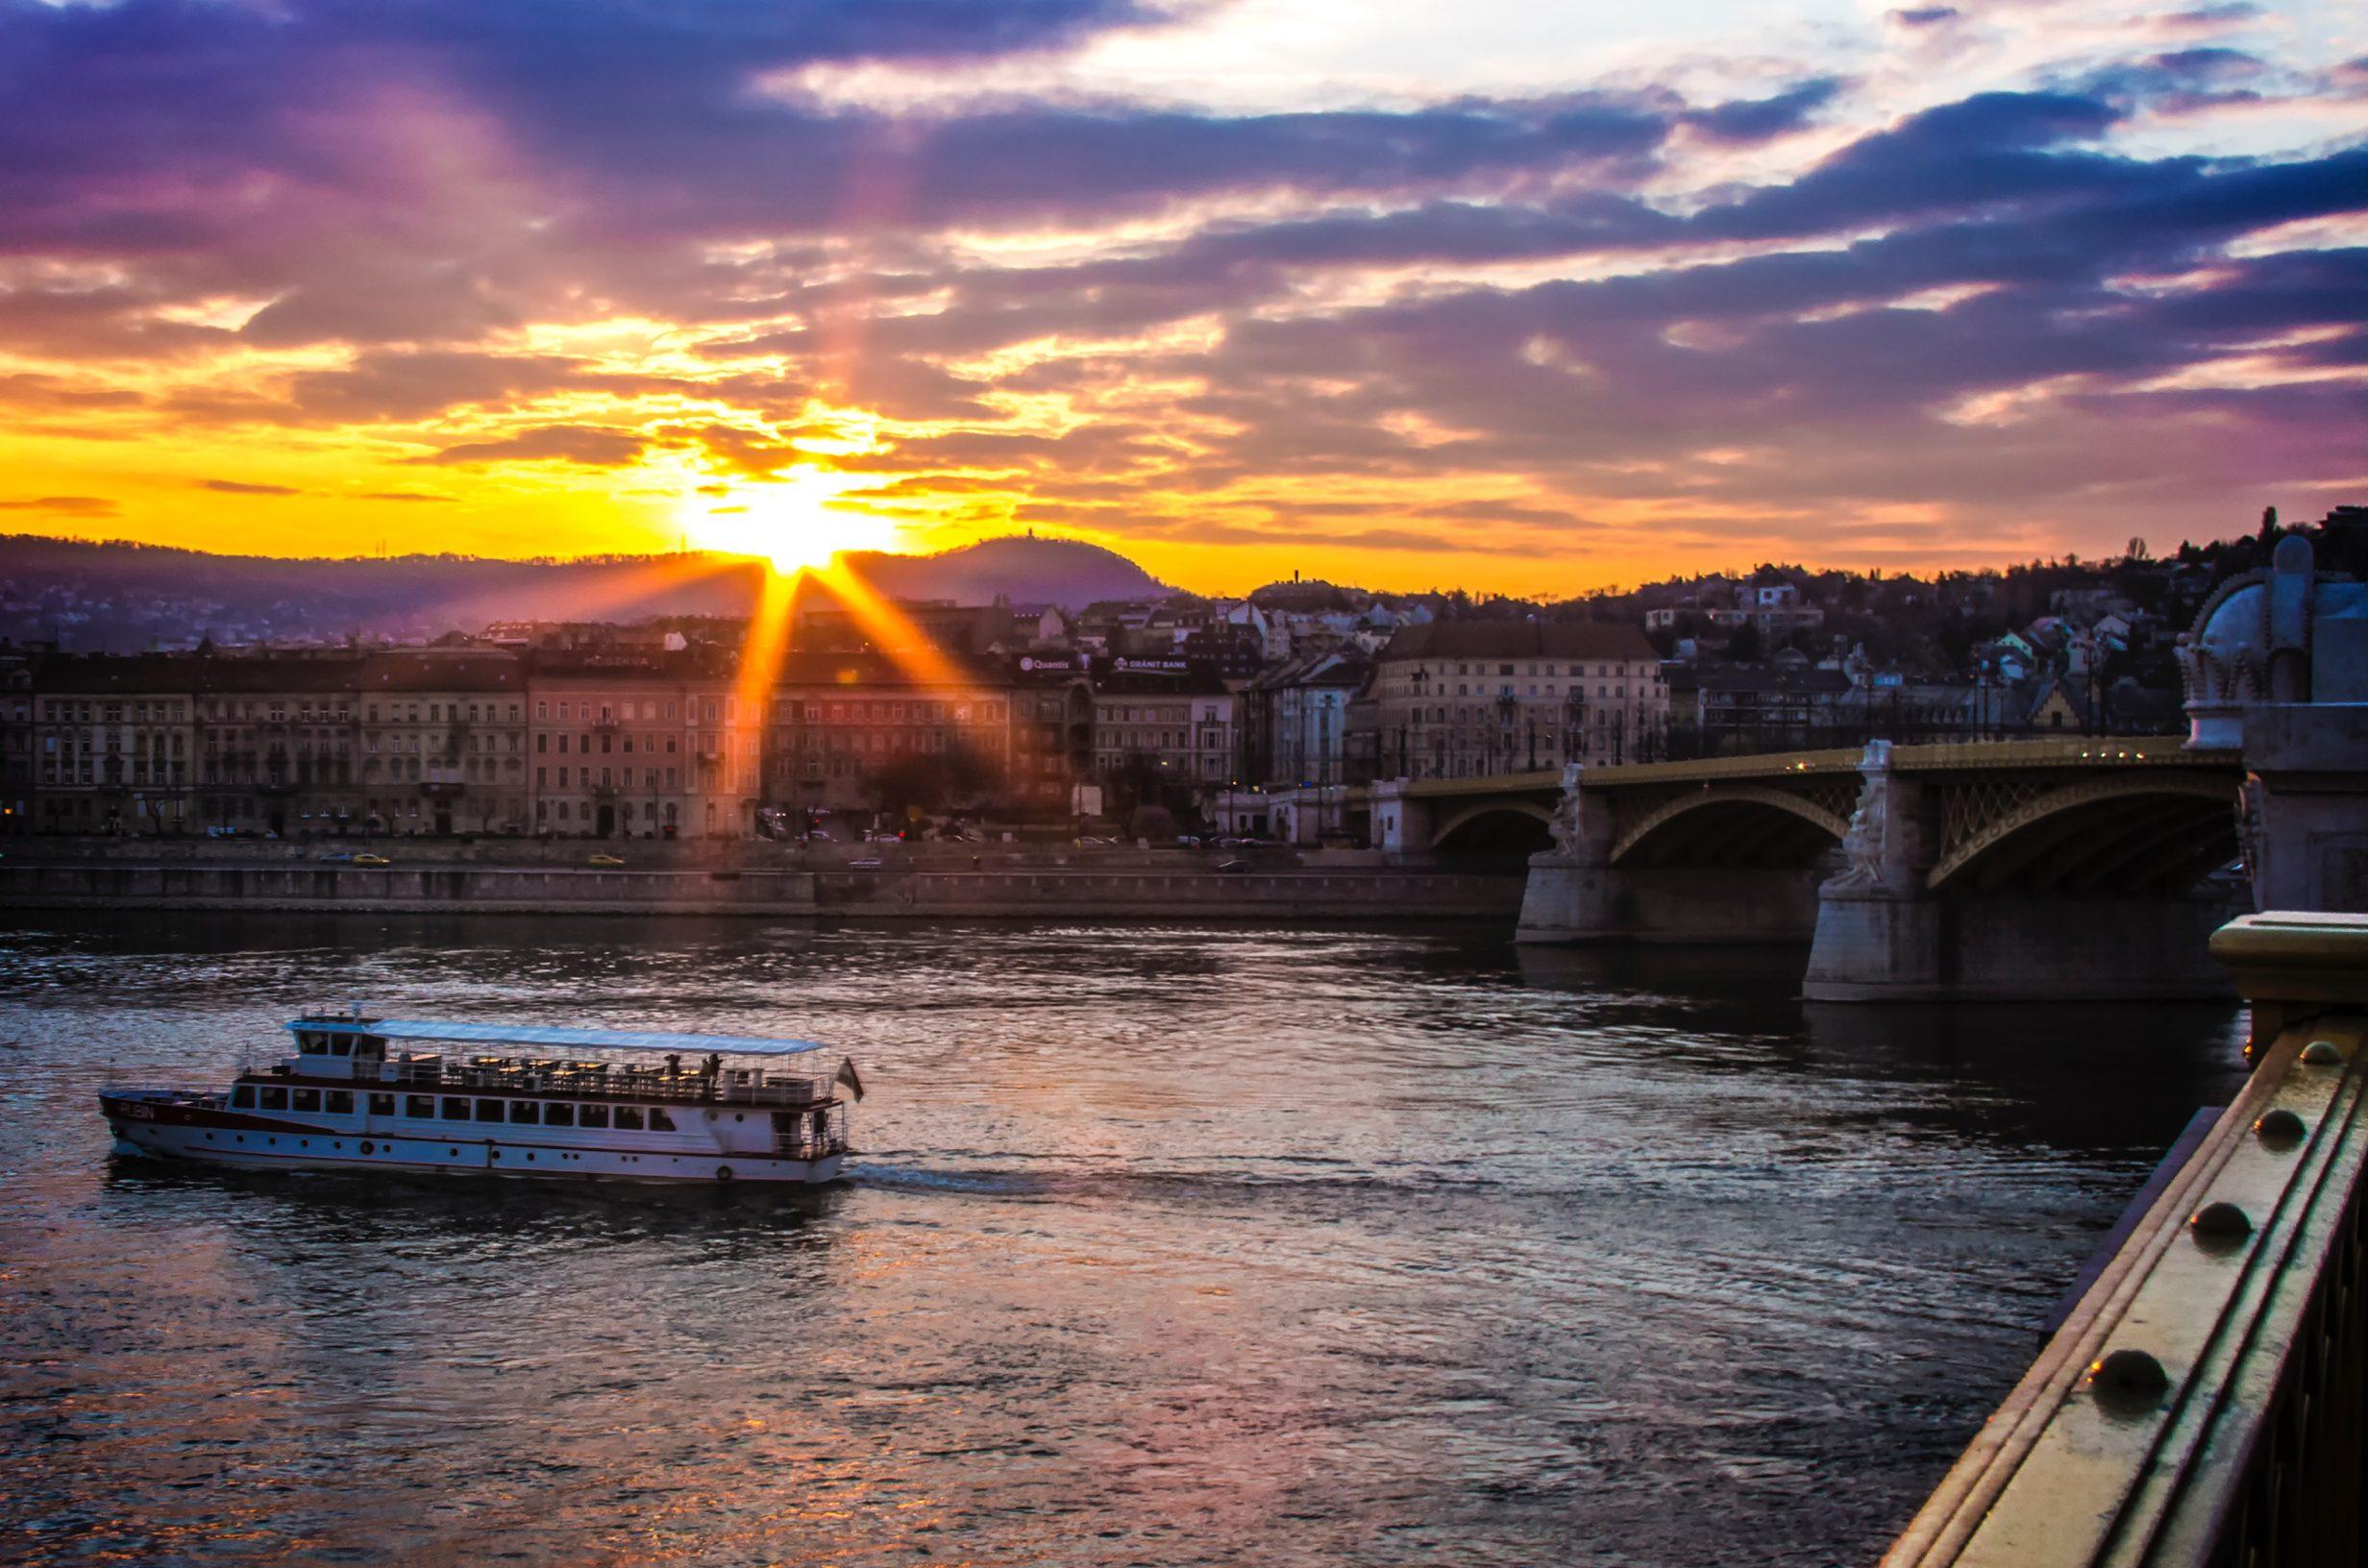 bridge-budapest-city-66191